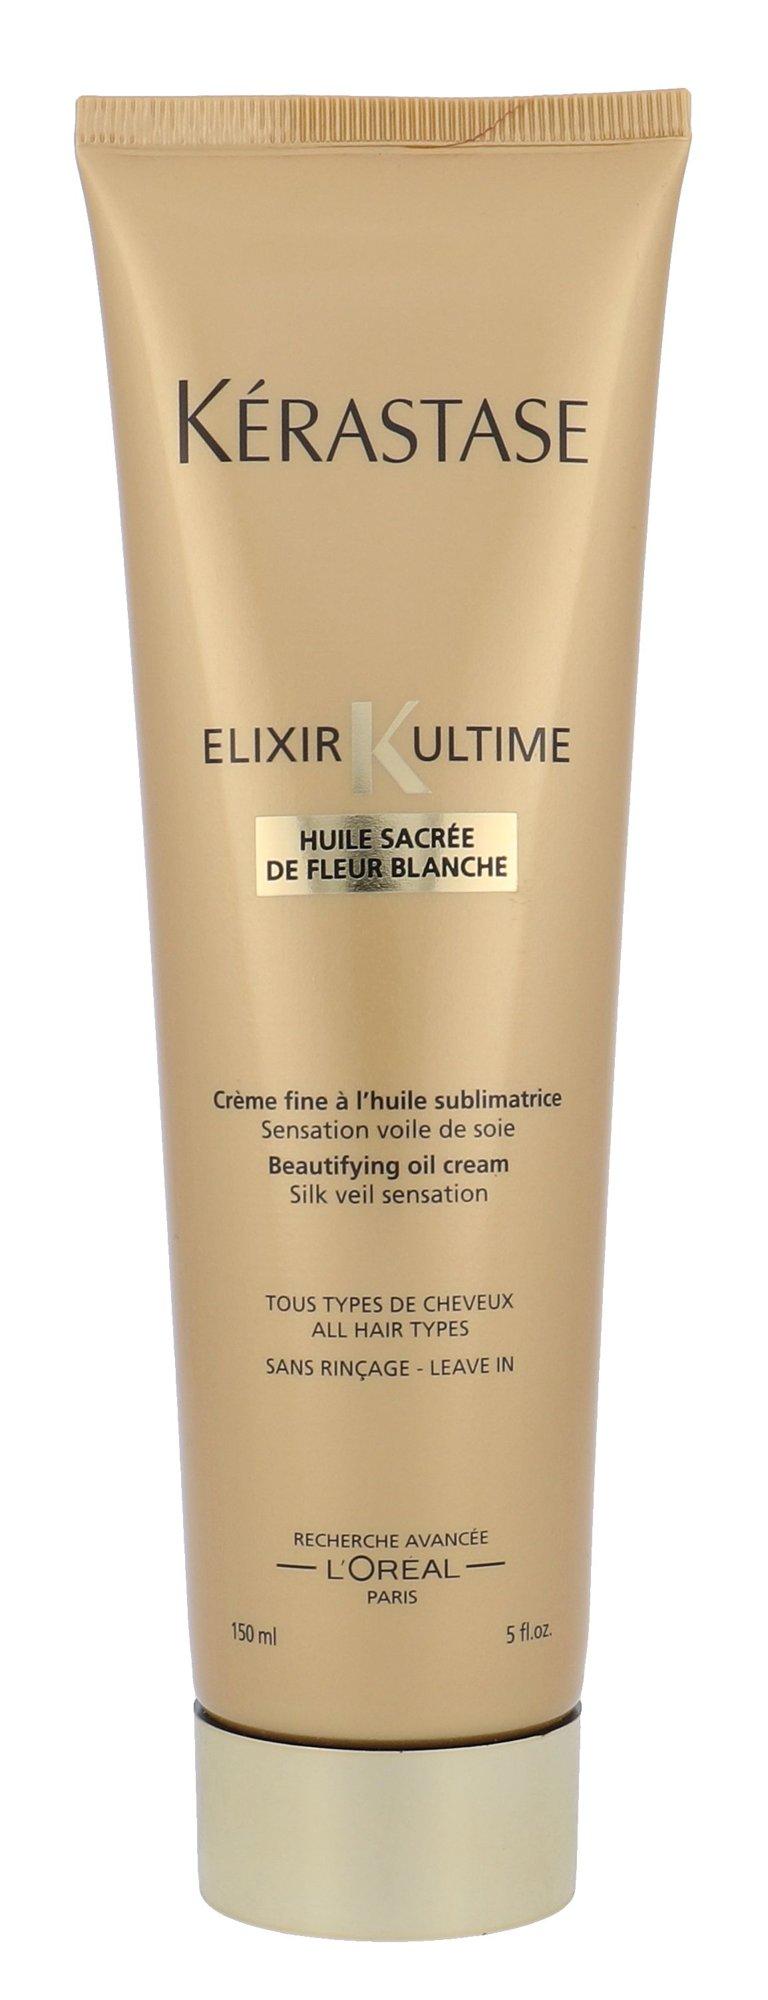 Kérastase Elixir Ultime Cosmetic 150ml  Beautifying Oil Cream